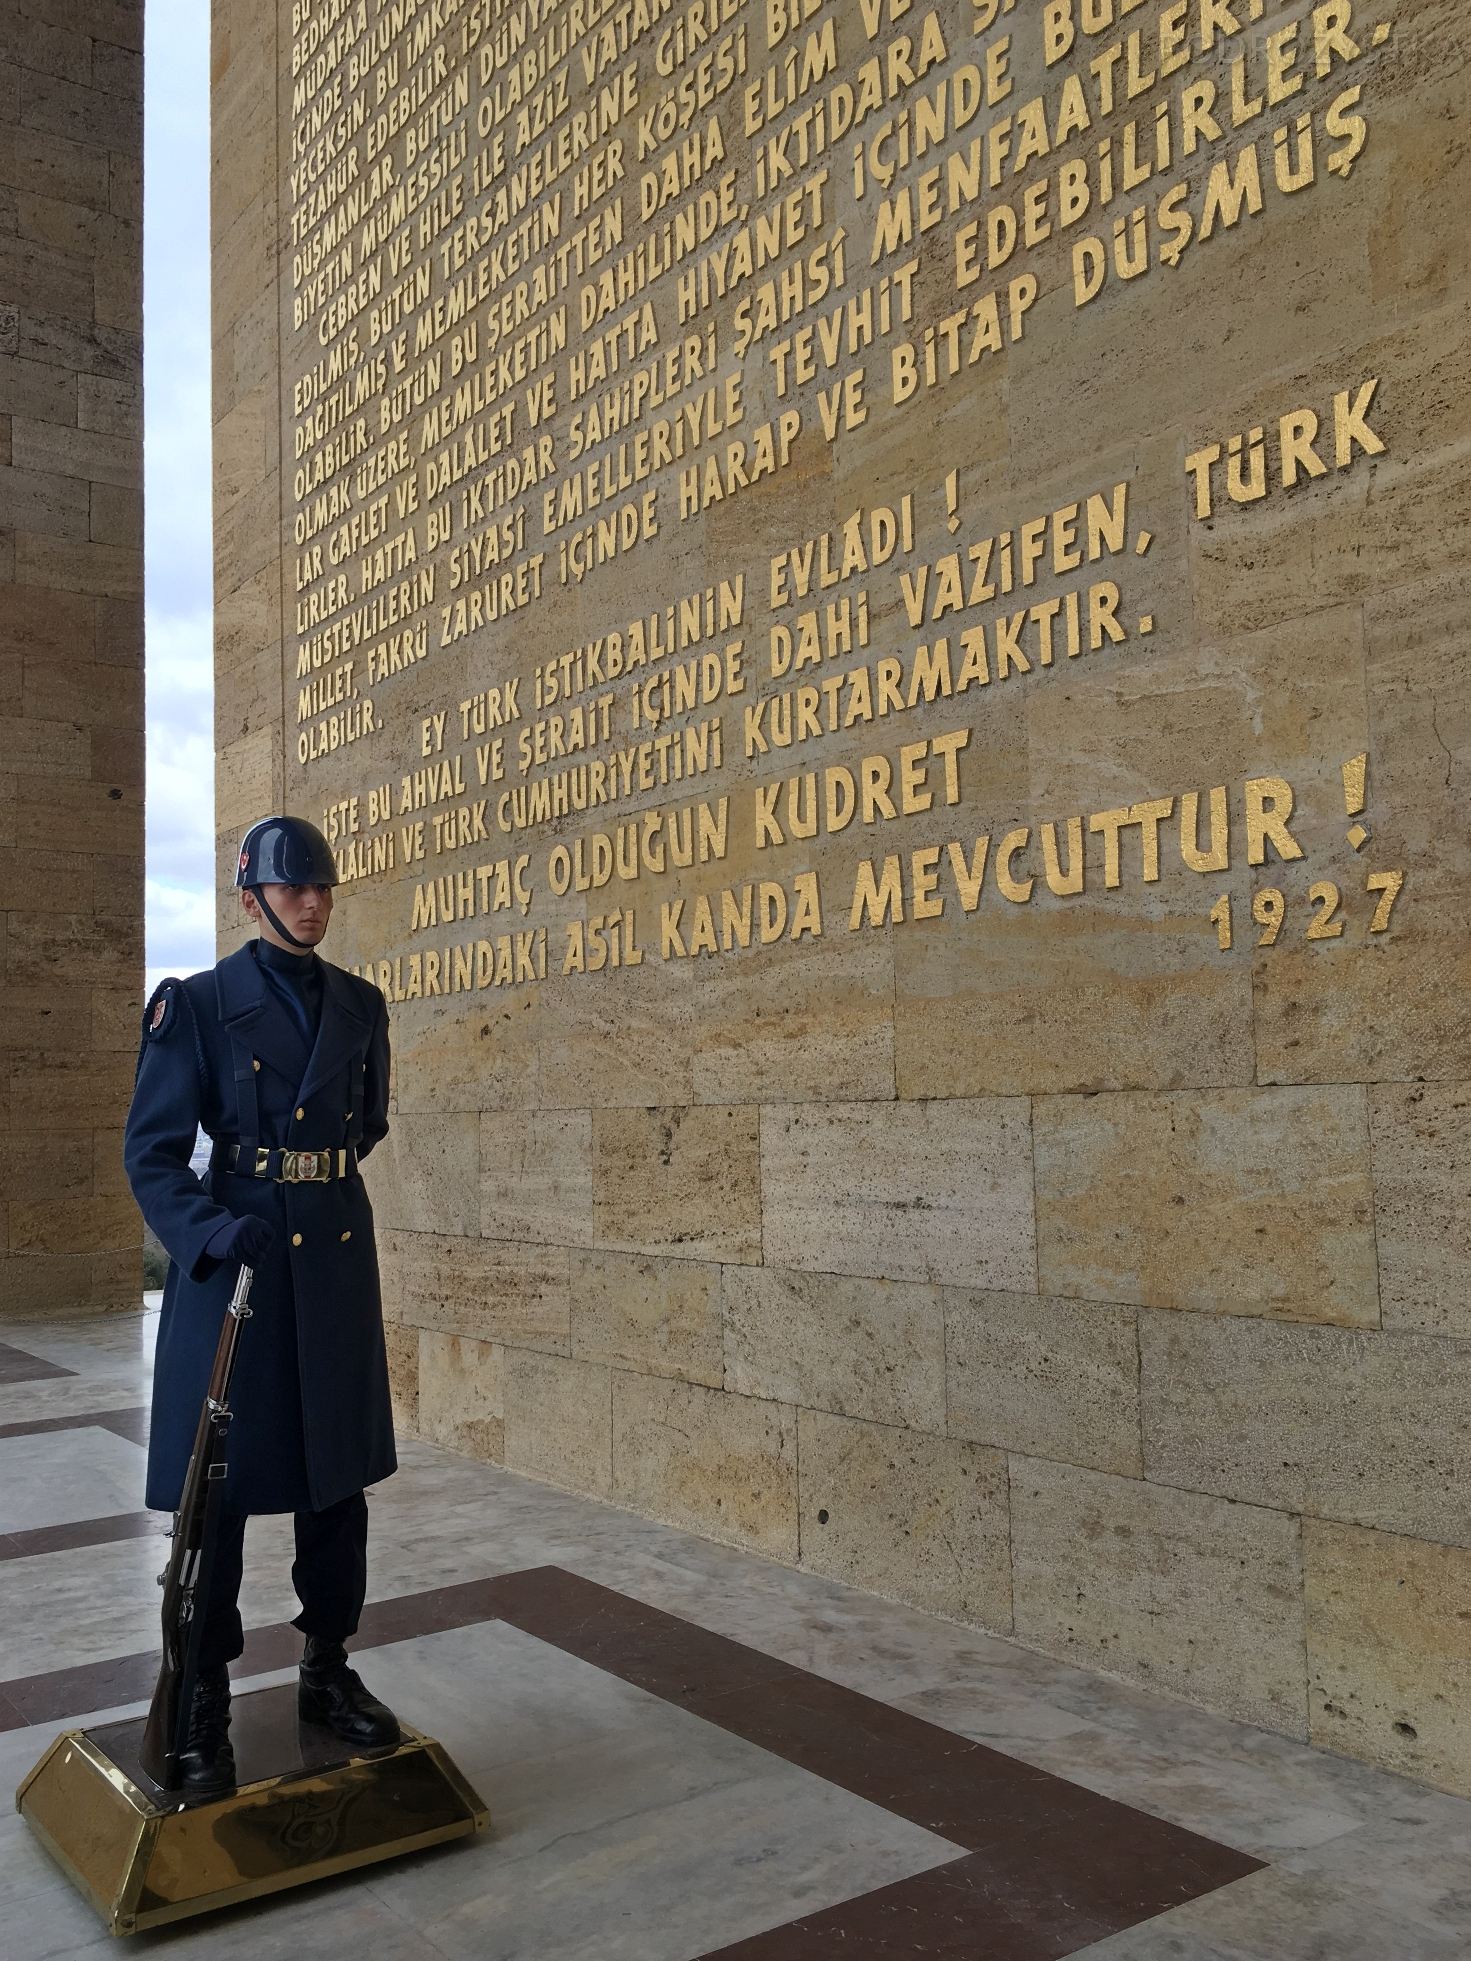 Ankara_18_50_size_watermark